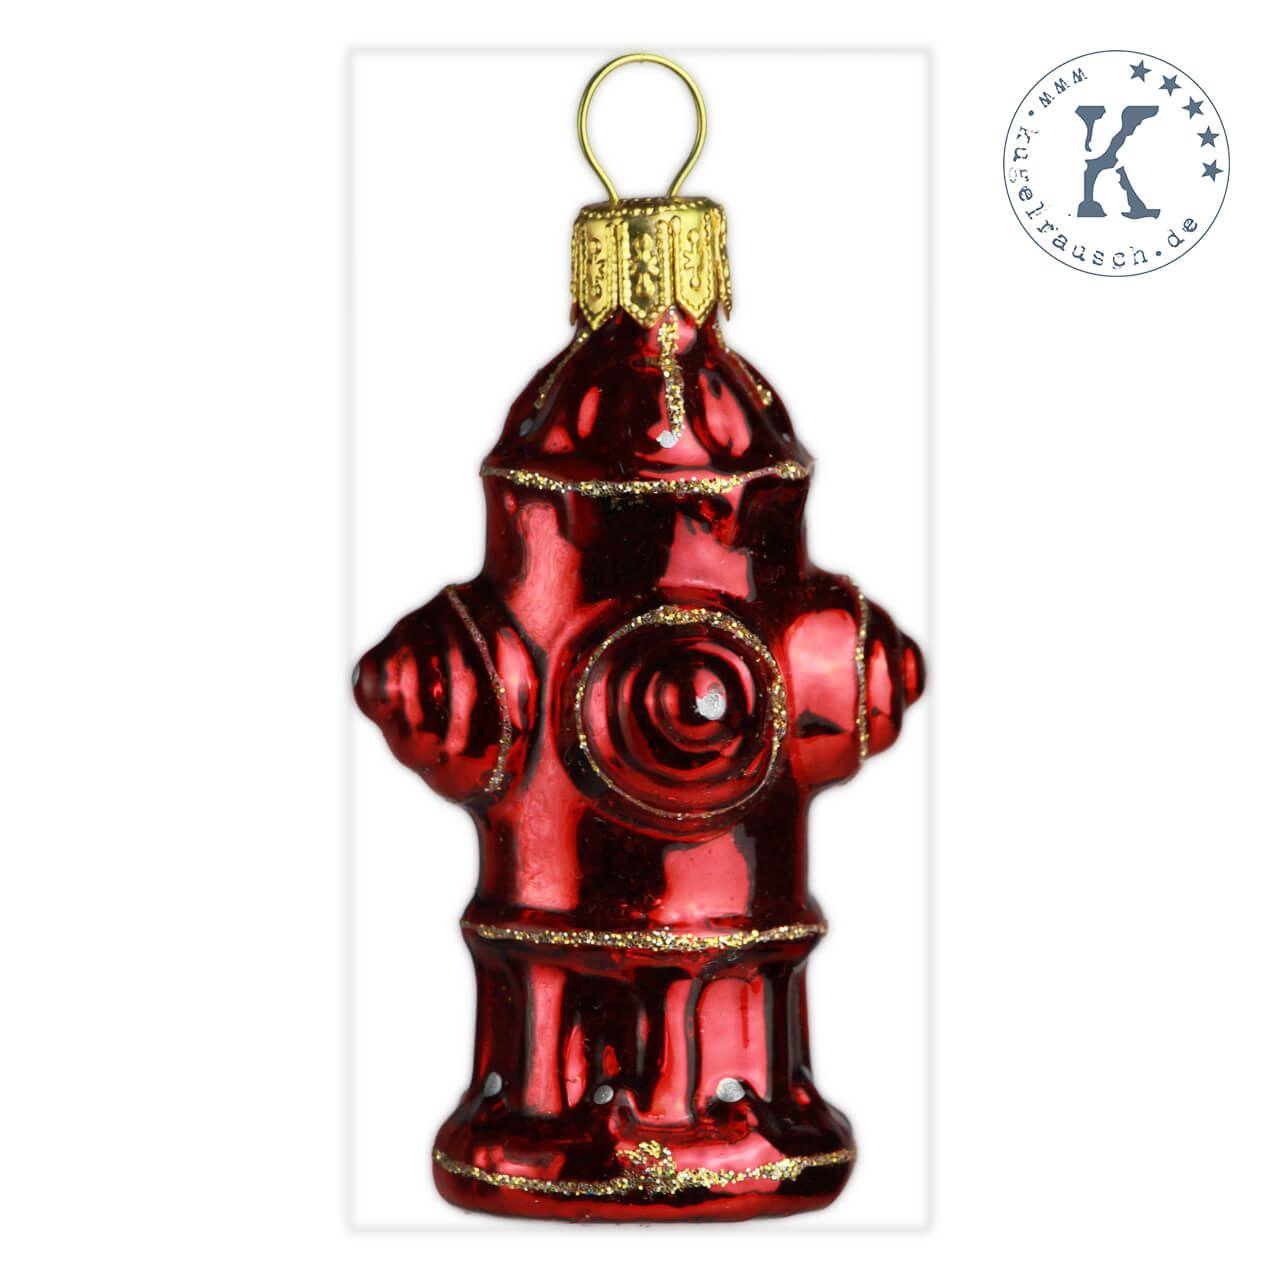 Christbaumkugeln Feuerwehr.Christbaumkugel Hydrant Christbaumkugeln Christmas Ornaments